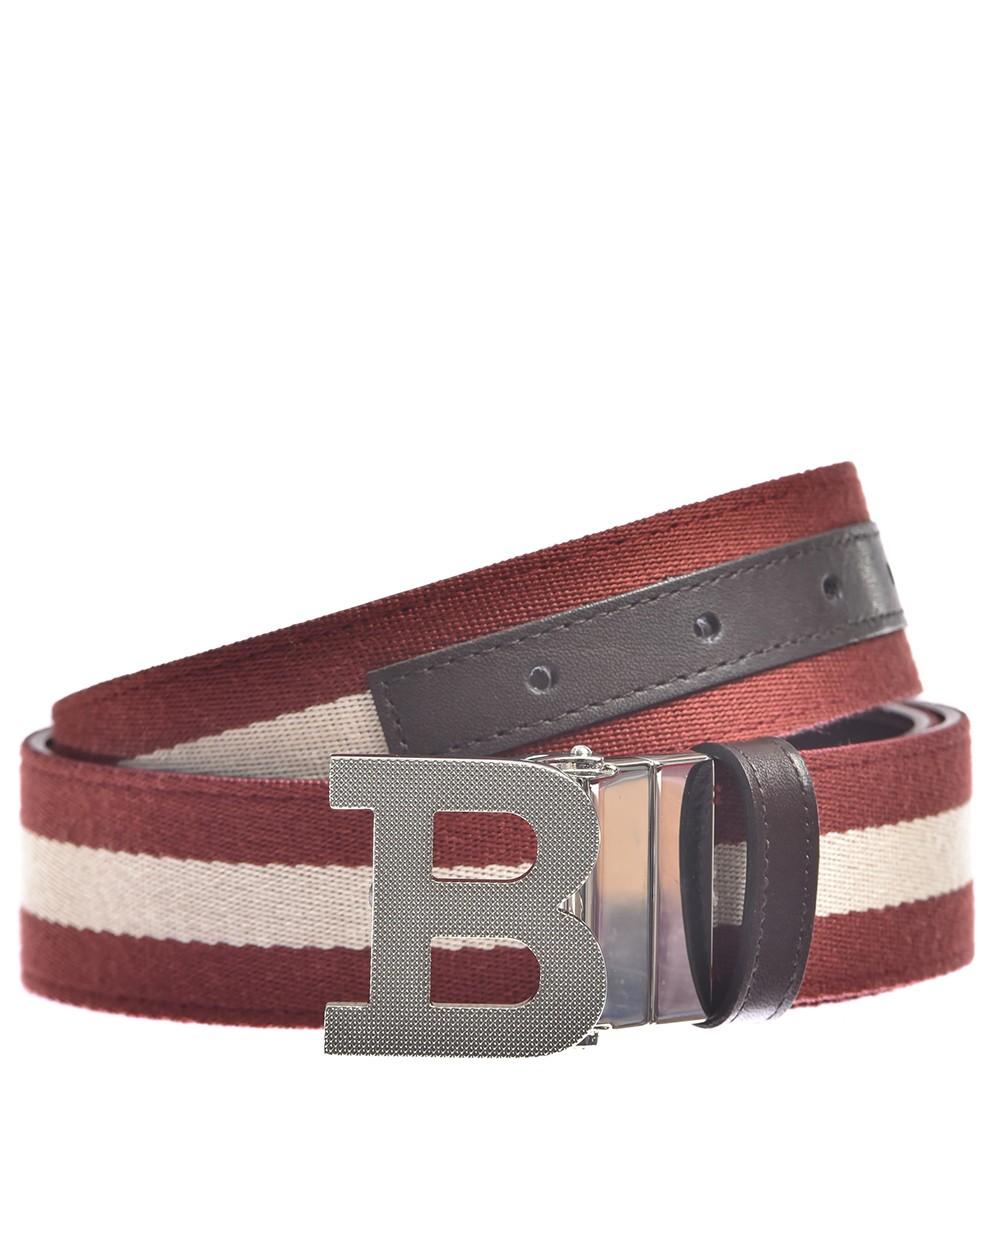 BALLY CINTURA B BUCKLE 6221450